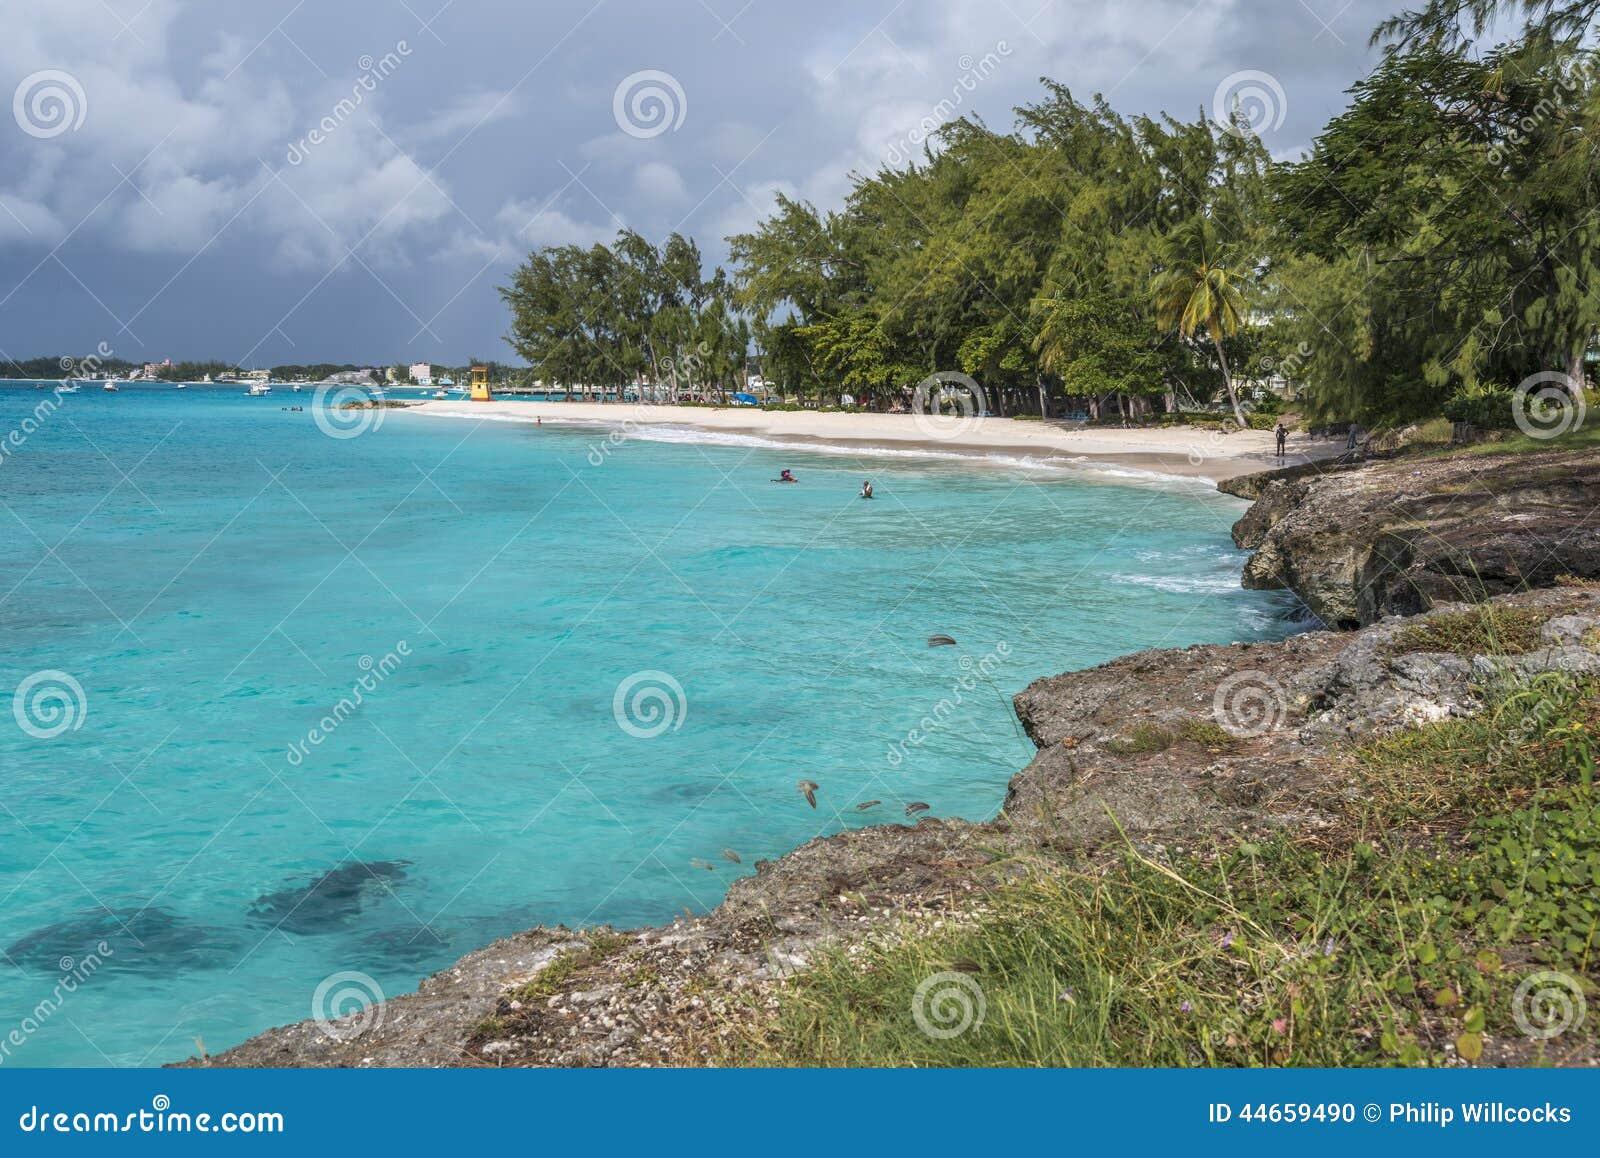 miami beach barbados editorial image. image of island - 44659490